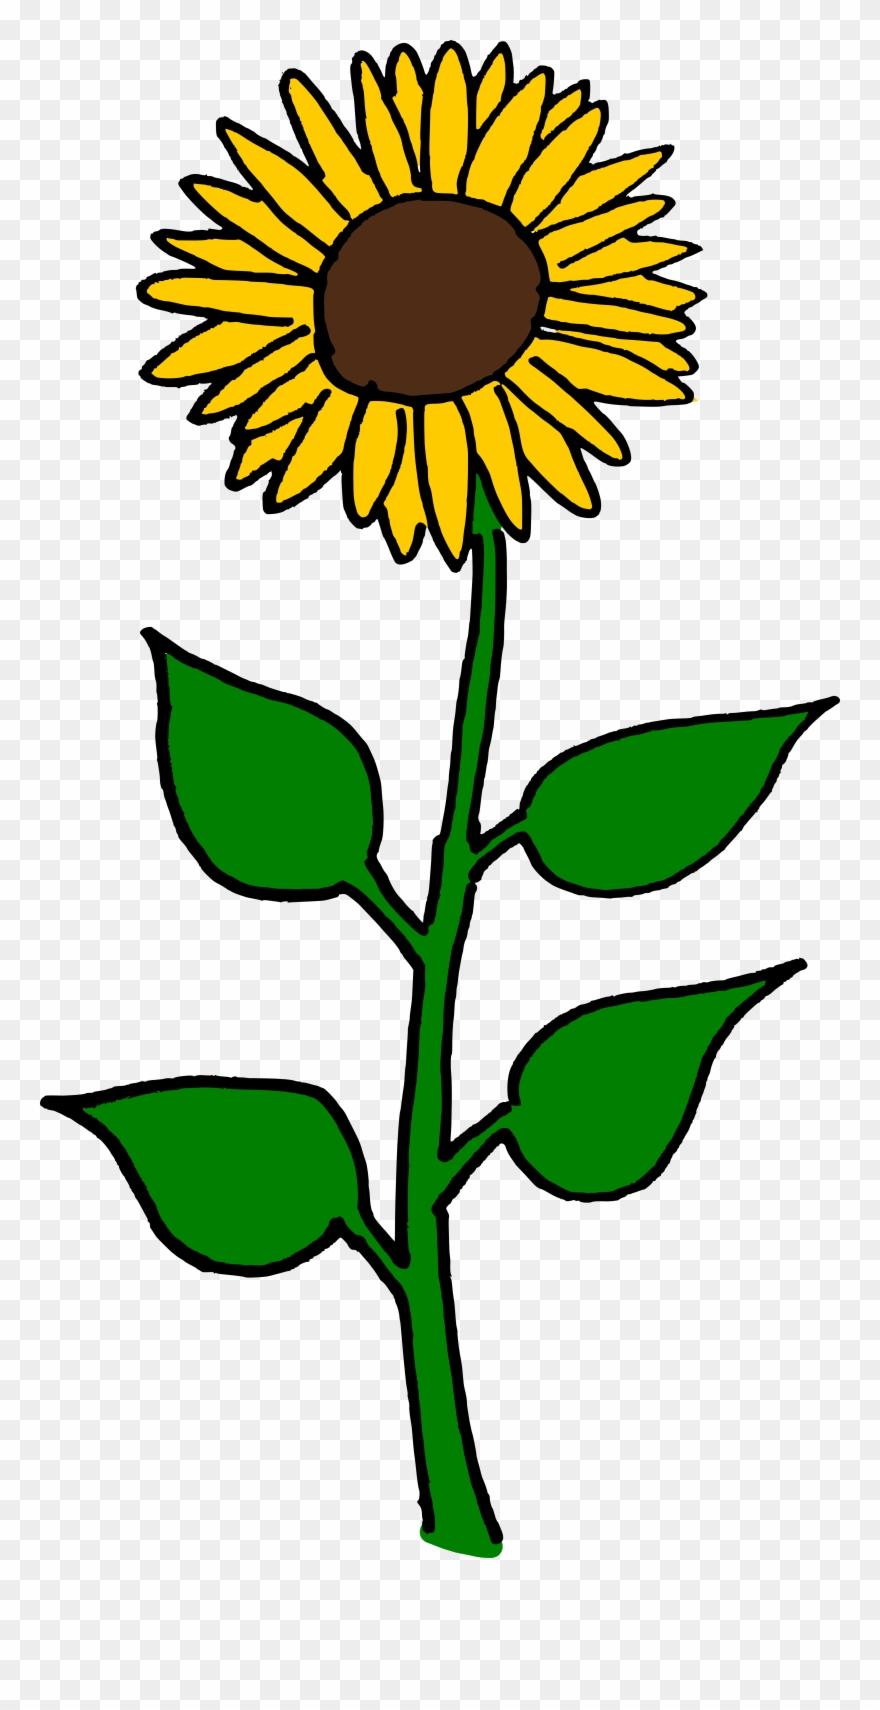 Flower Clipart Sunflower.